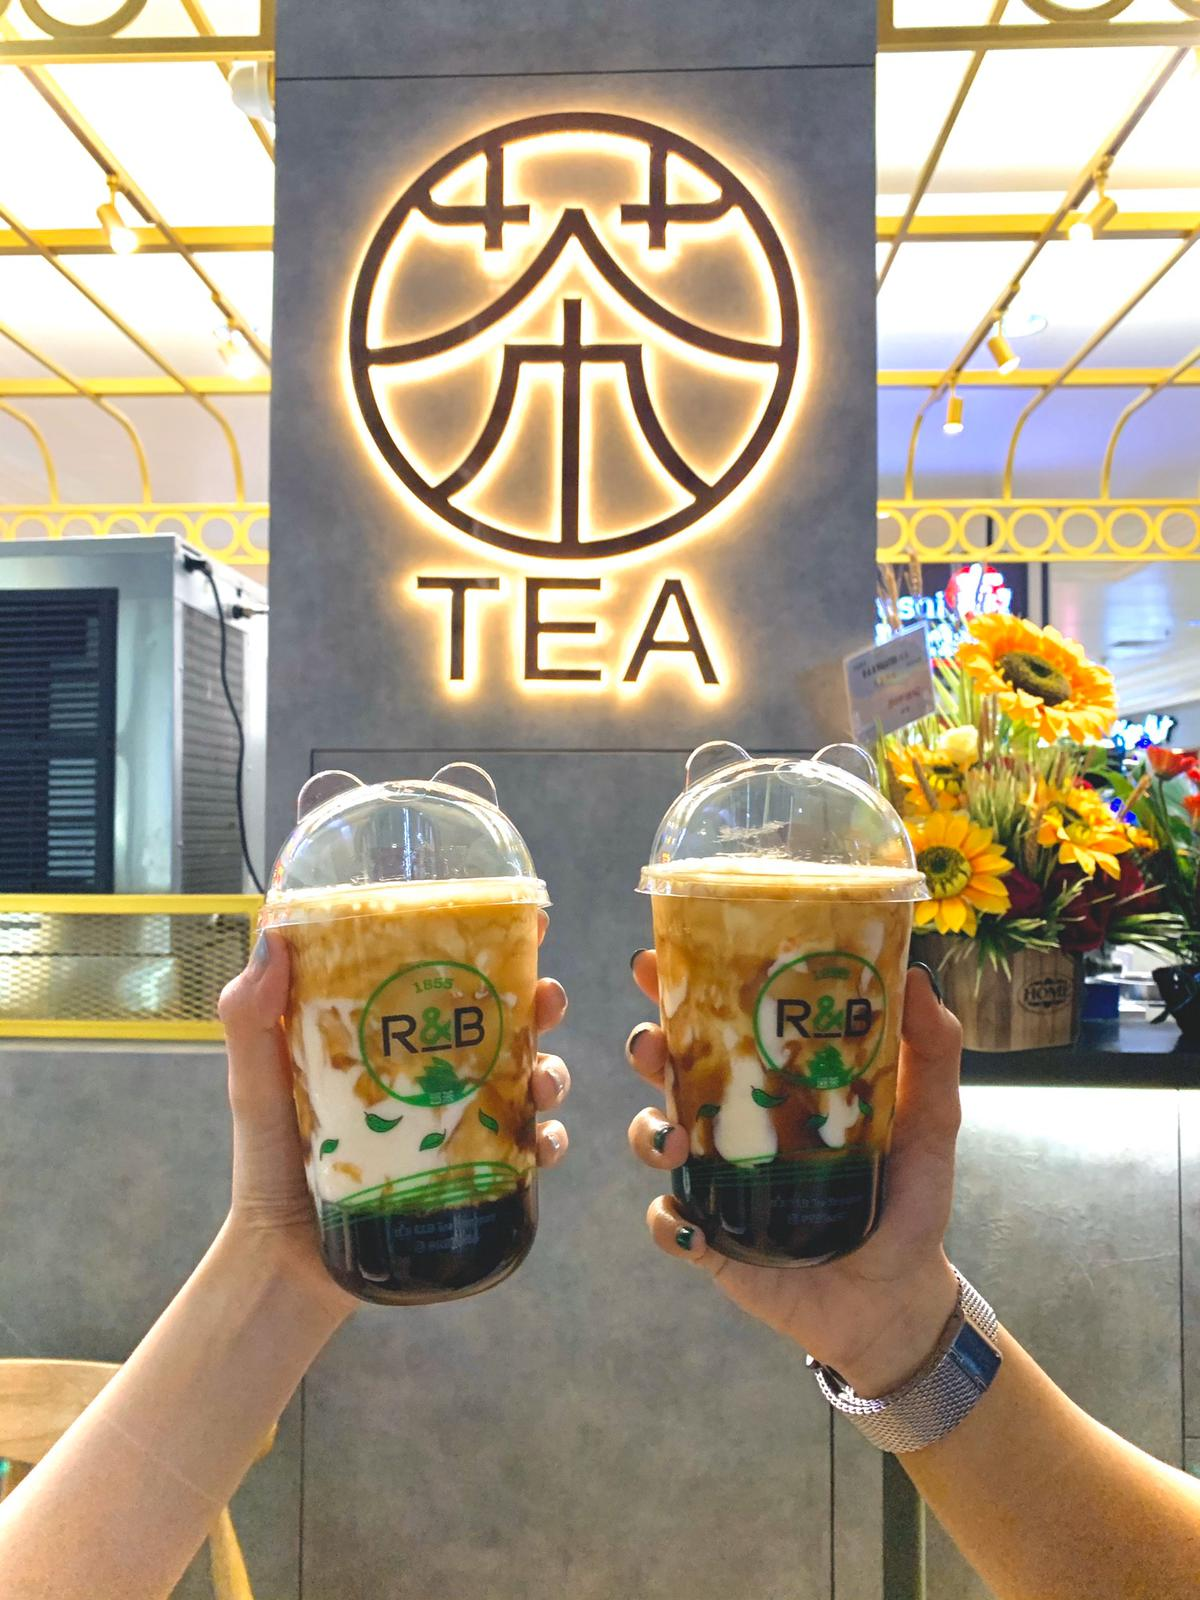 R&B Tea Best Bubble Tea